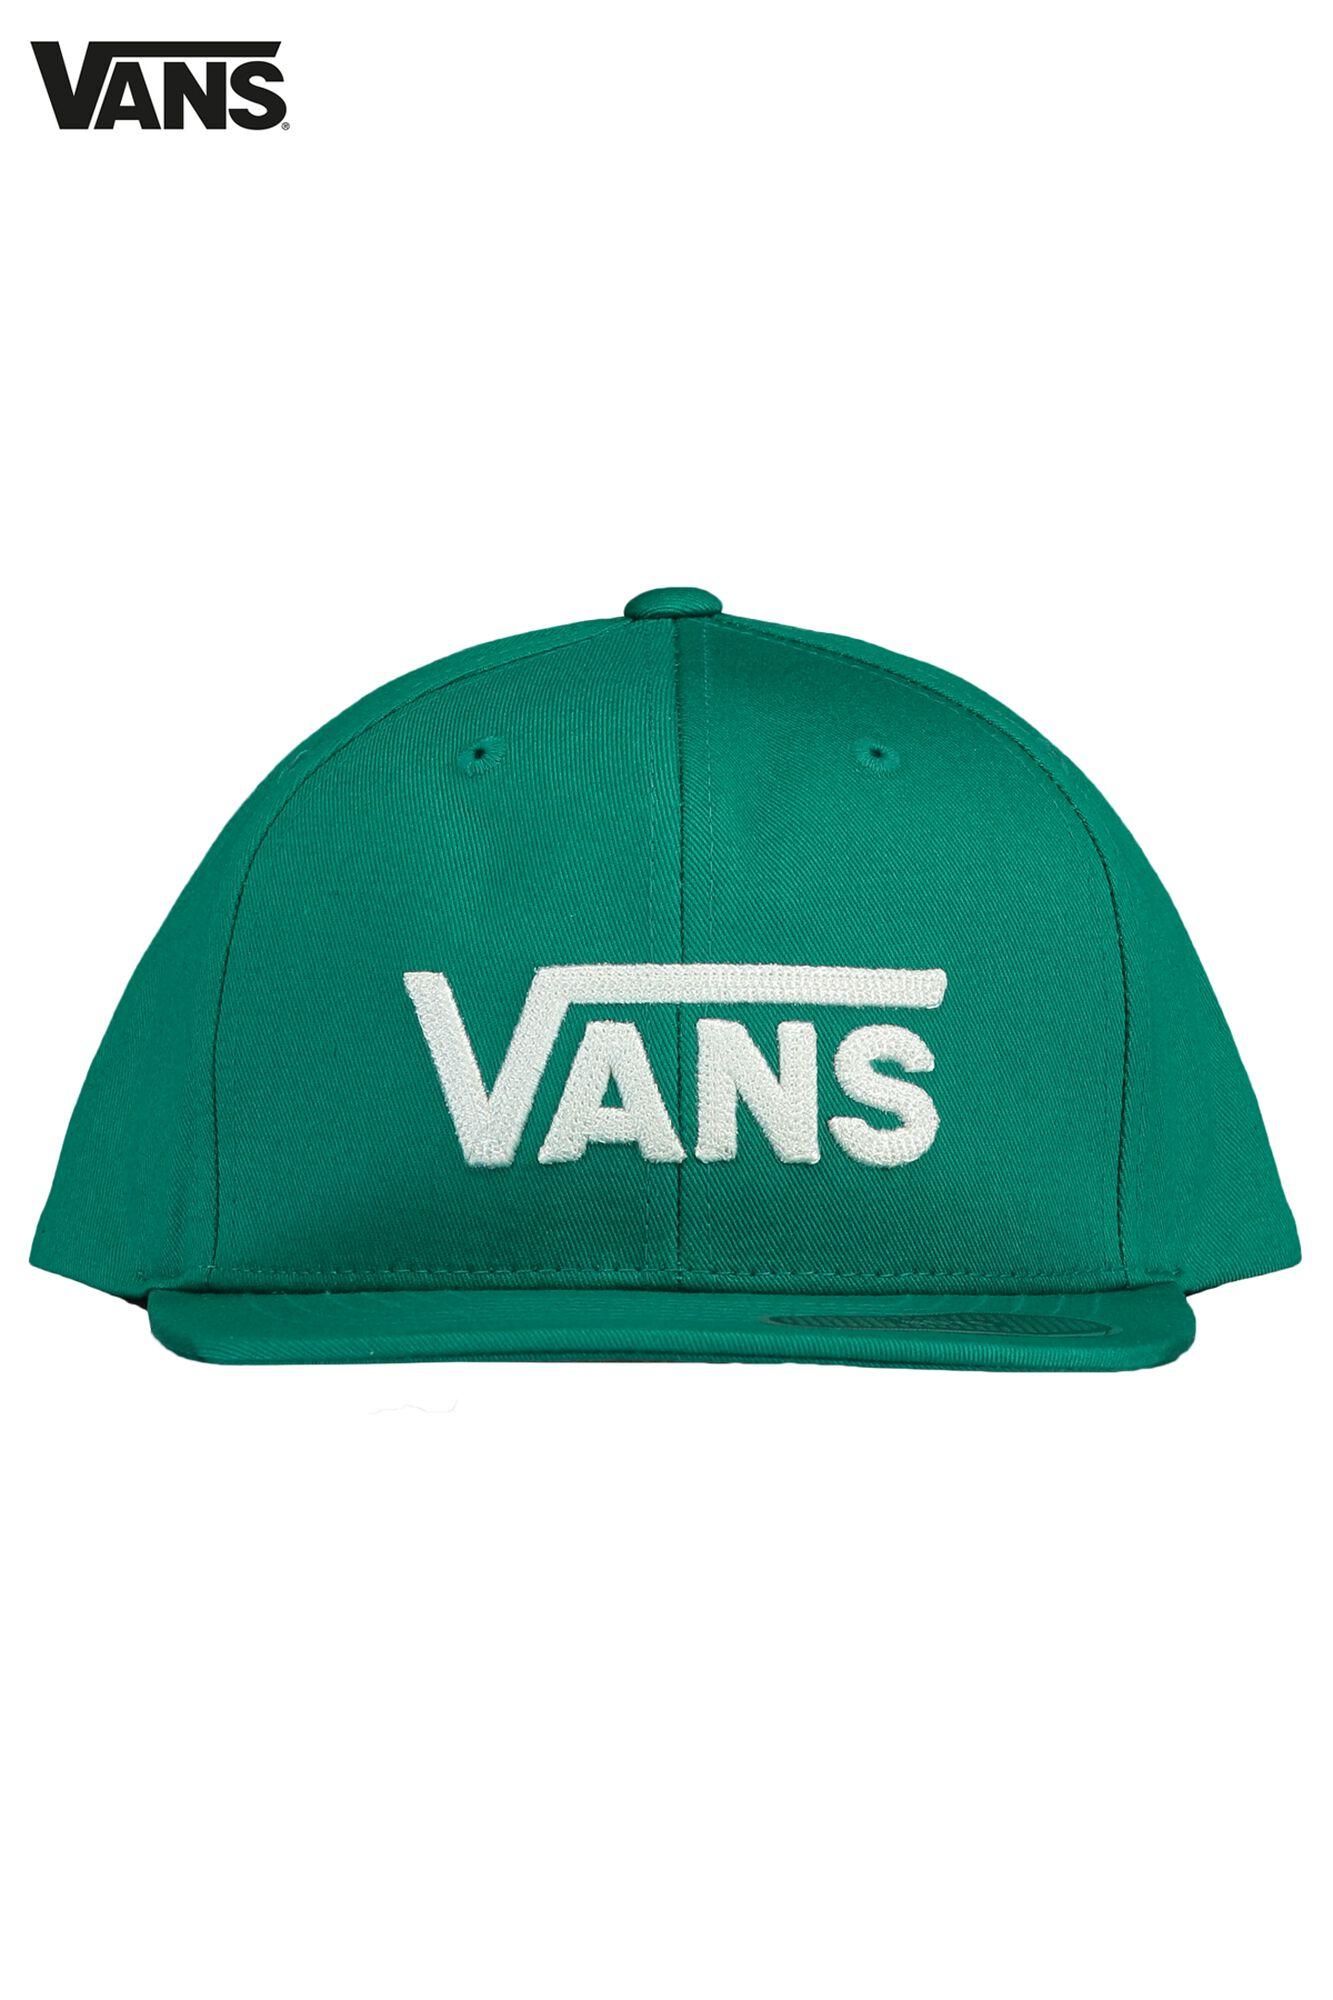 b9095bd65 Boys Cap Vans Snapback boys Blue Buy Online